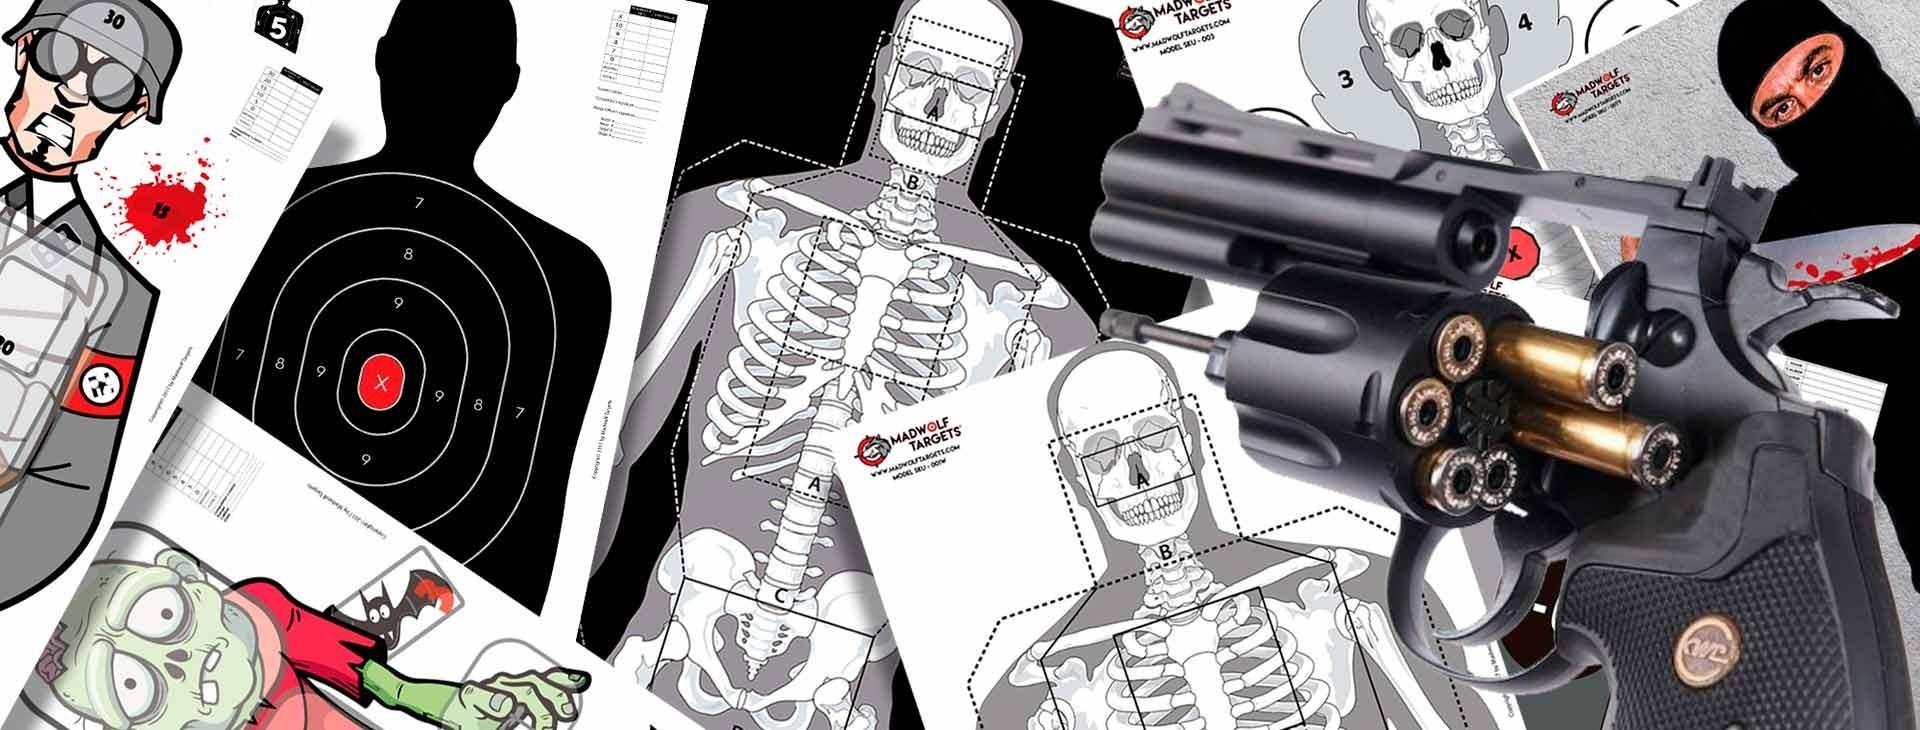 Blancos de tiro en papel - Policiales - Madwolf Targets